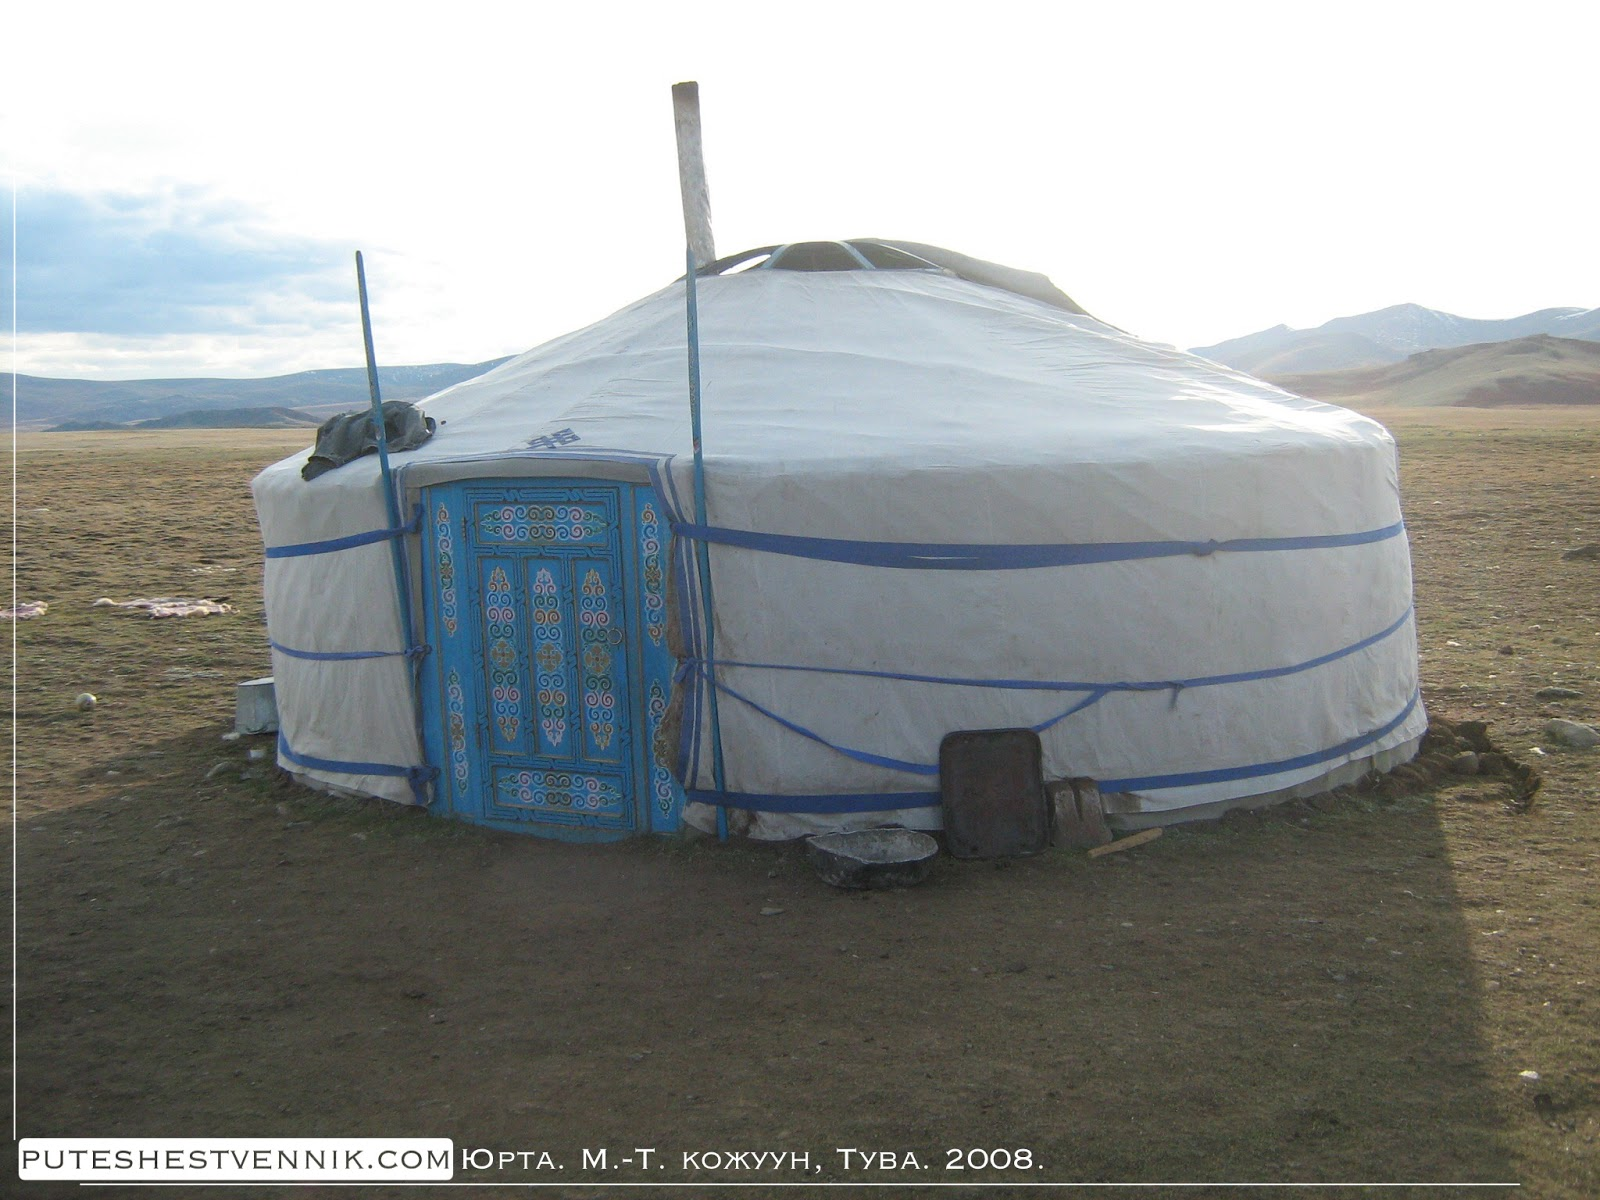 Юрта - традиционное жилище тувинцев